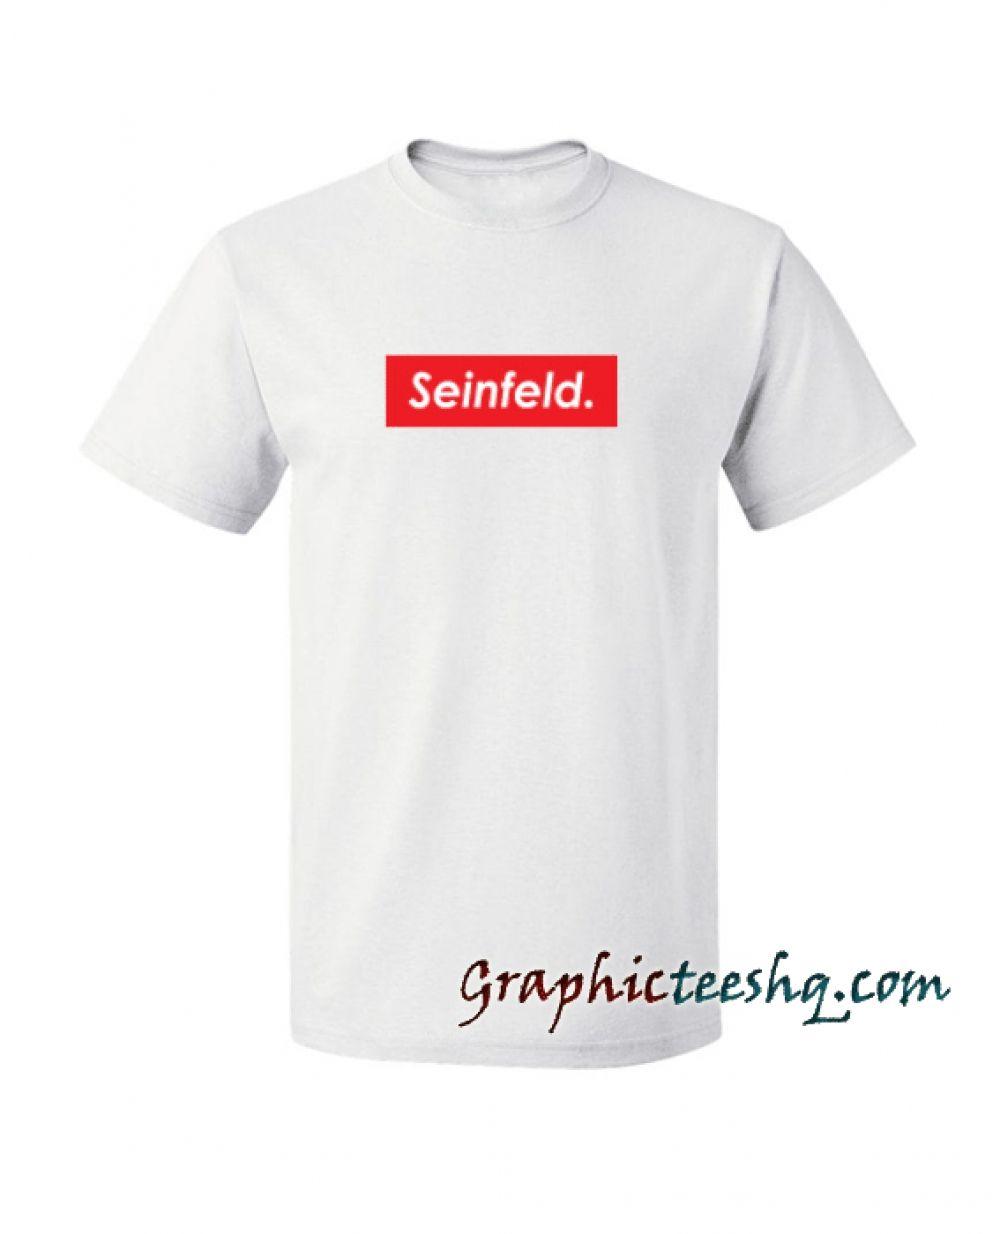 Seinfeld Supreme Tee Shirt Seinfeld Supreme Tee Shirt //Price: $13.50 //